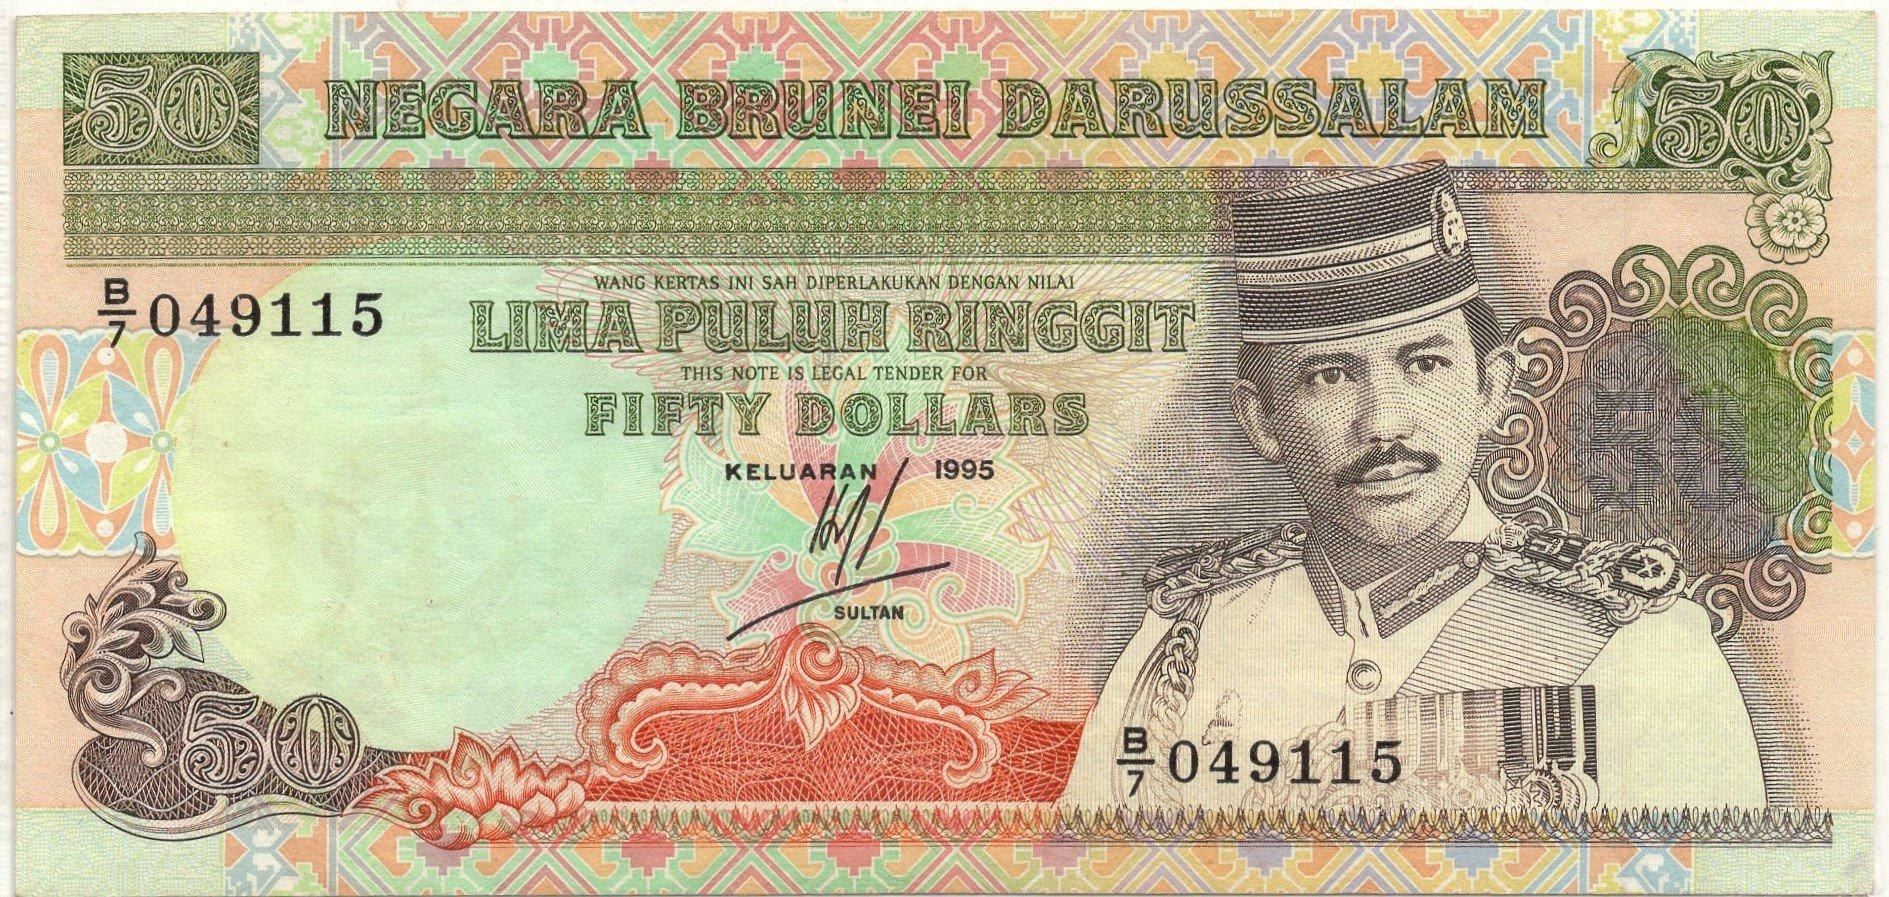 brunei 50 ringgit 1990  banknote for sale